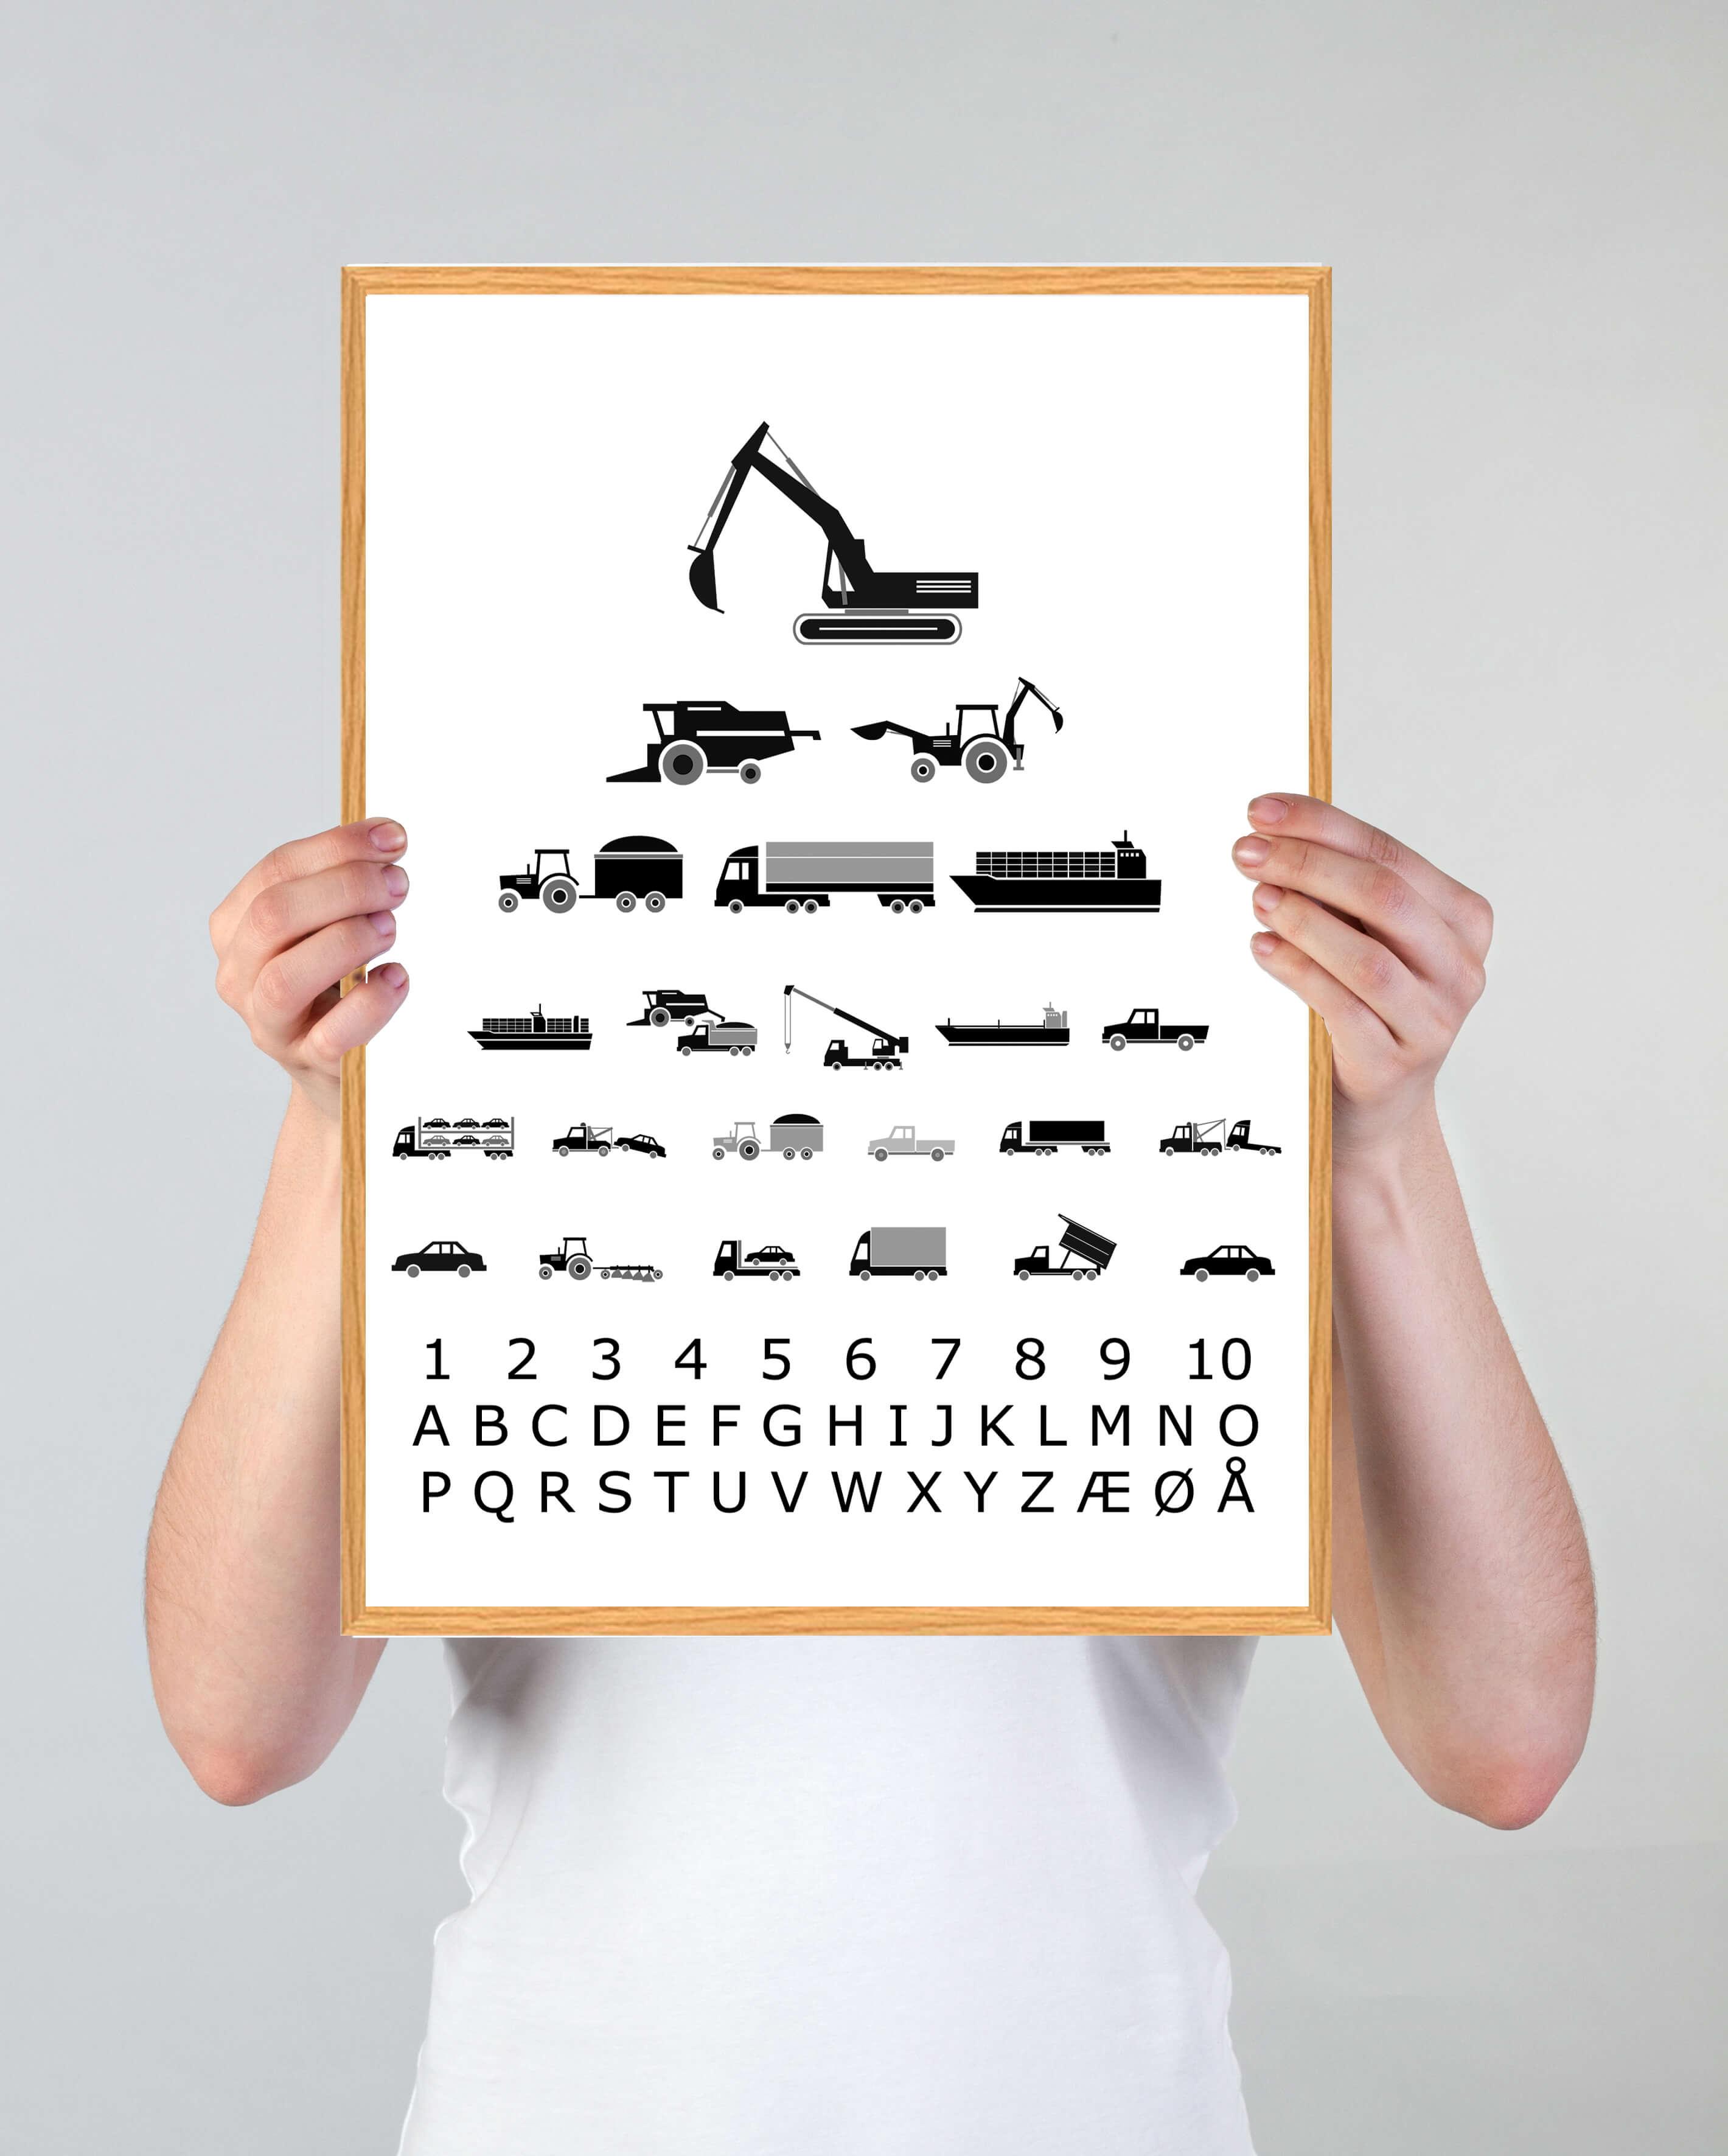 synstavle-biler-dreng-1